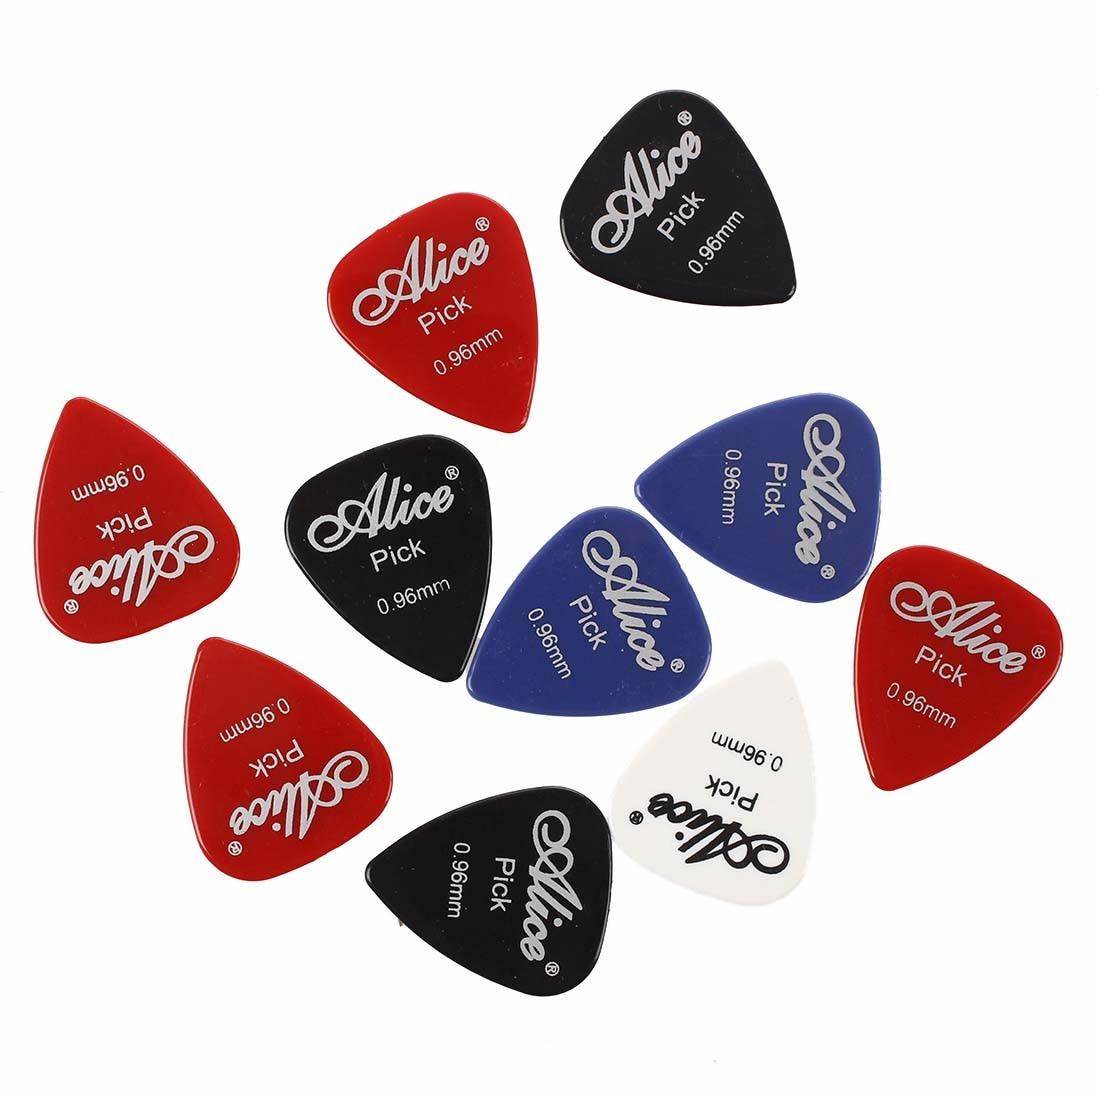 SYDS 10x Plectrum Guitar Accessories Alice Guitar Pick 0.96mm